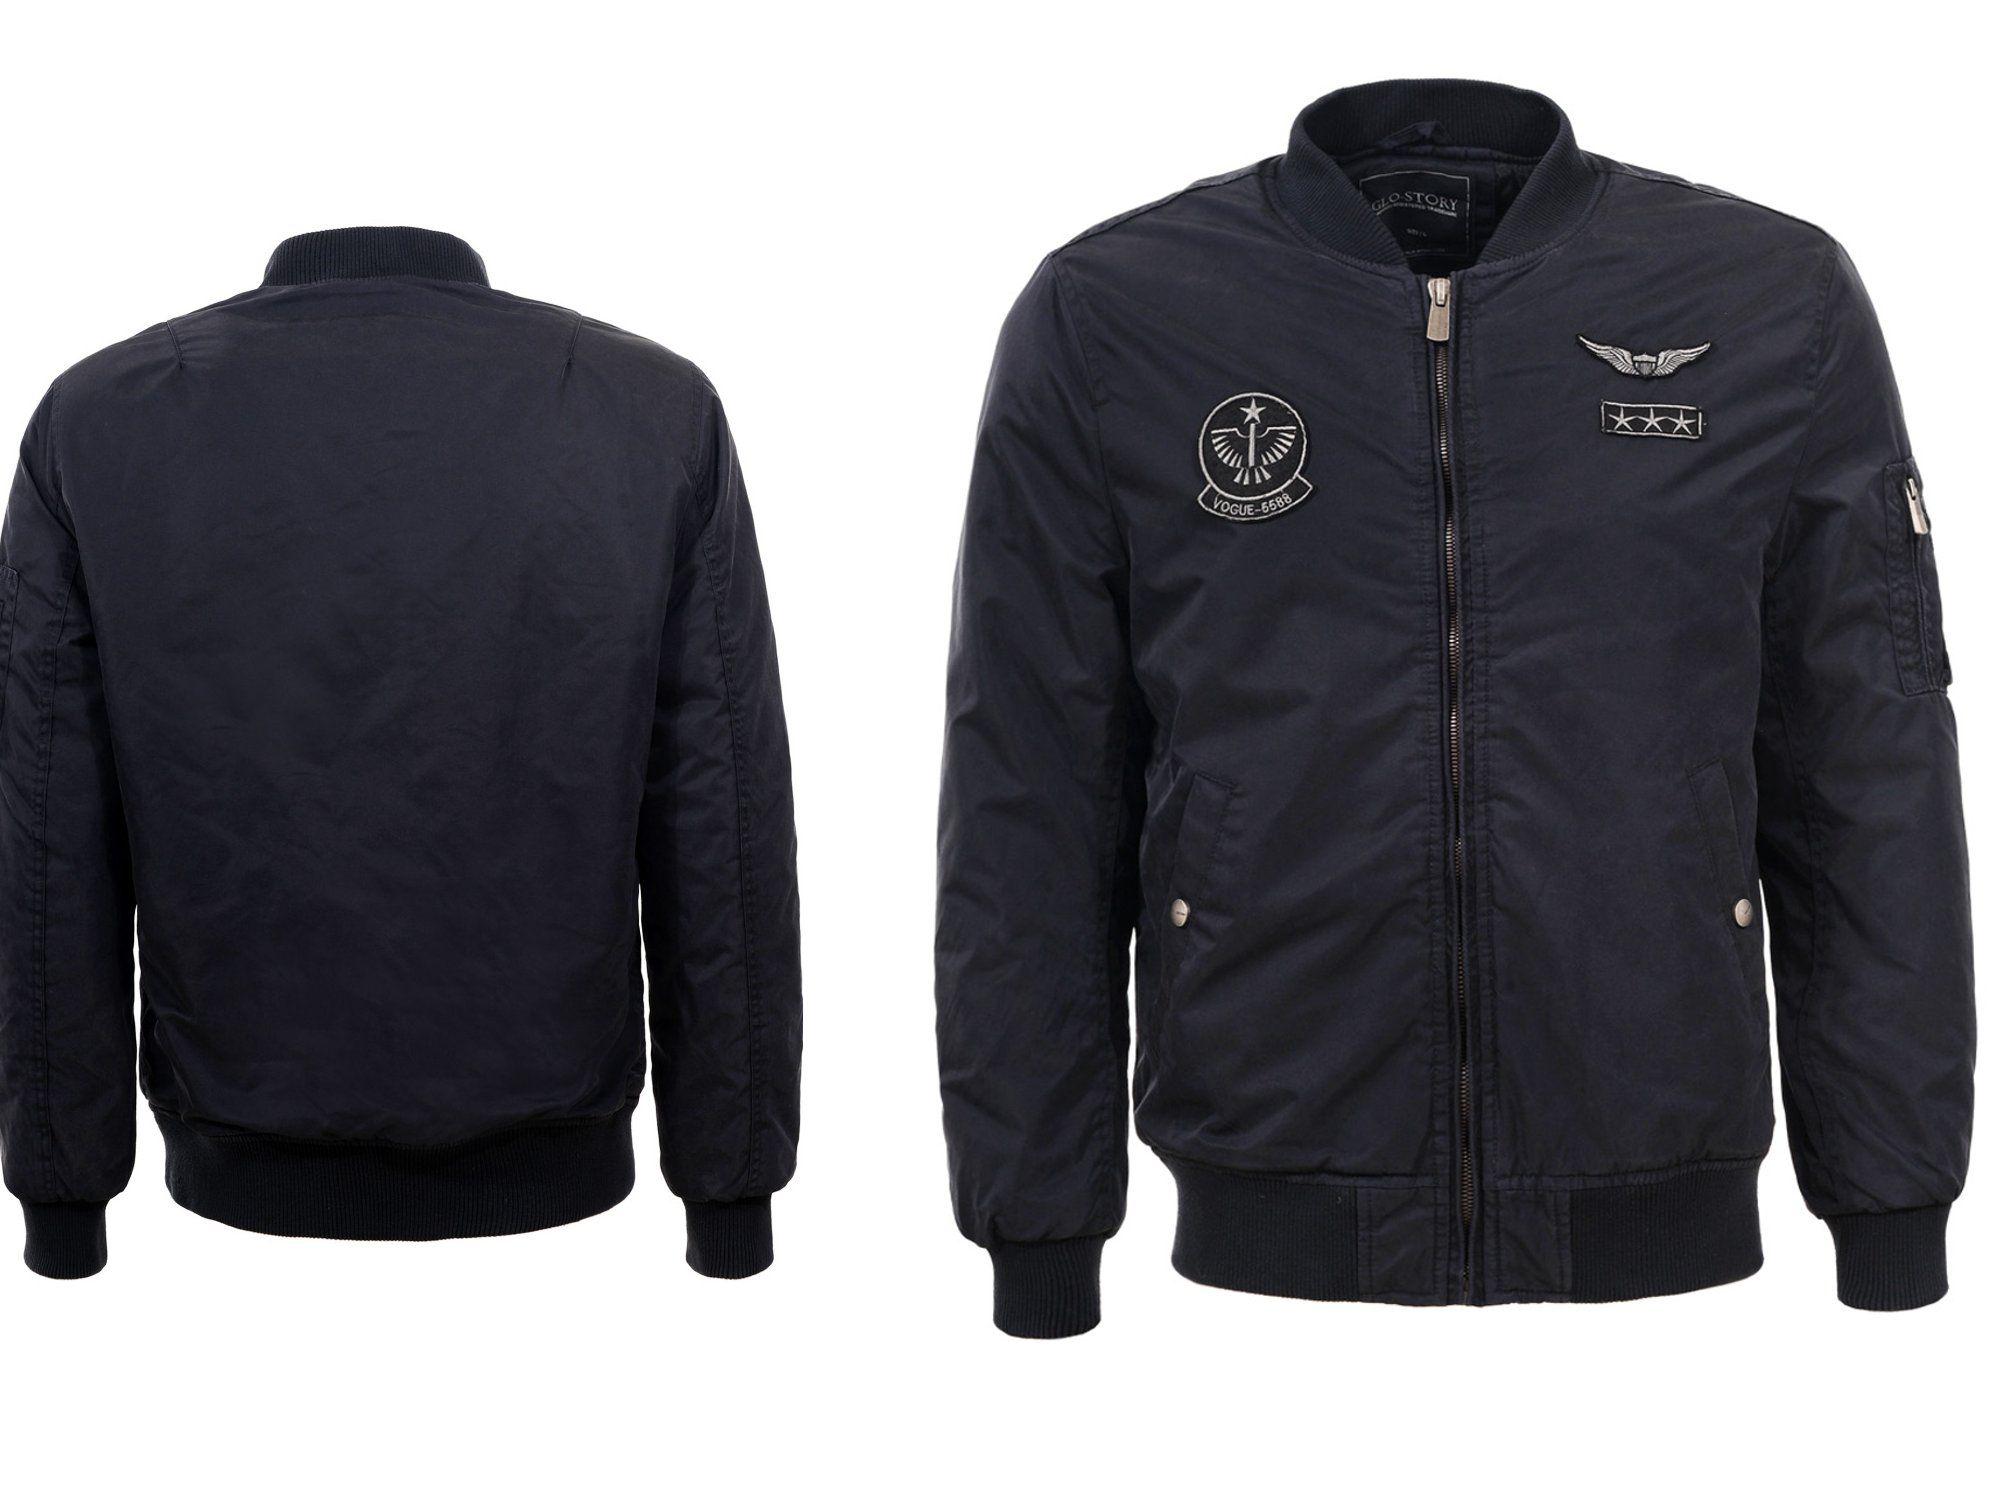 Kurtka Meska Bomberka Jesienna Zimowa Granat L 6950899397 Oficjalne Archiwum Allegro Athletic Jacket Motorcycle Jacket Jackets